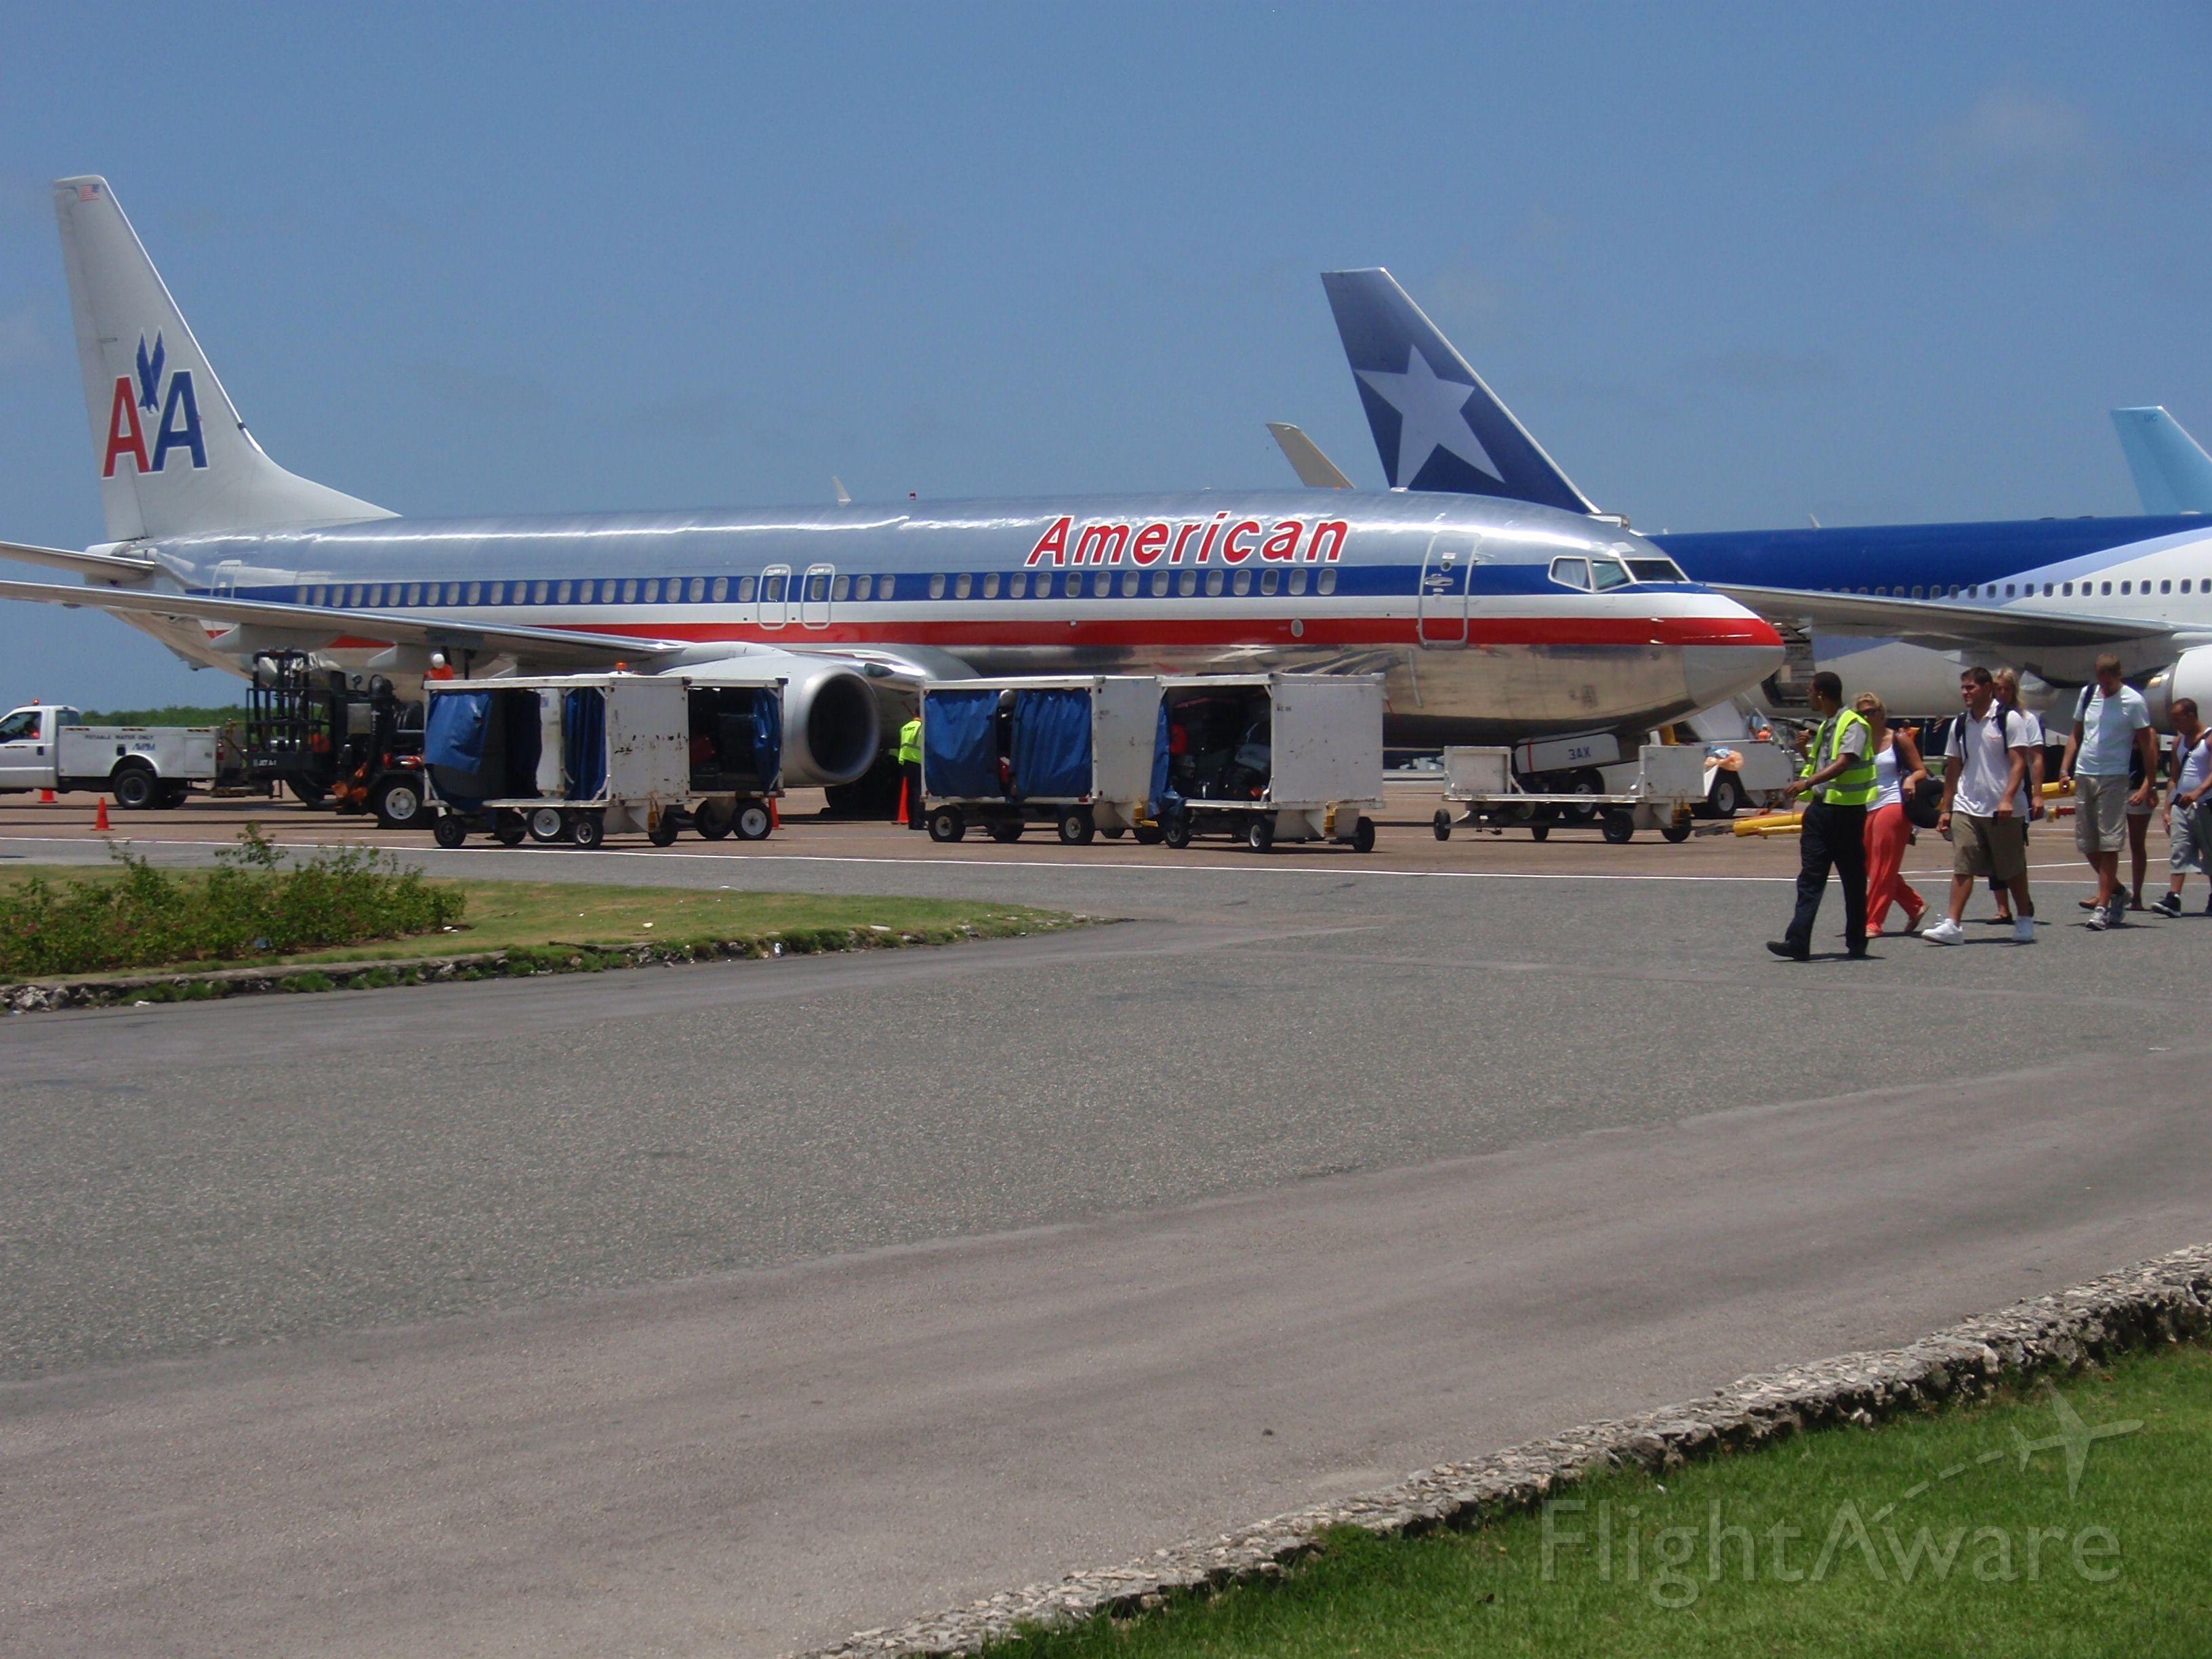 — — - Punta Cana, DR waiting to board flight.